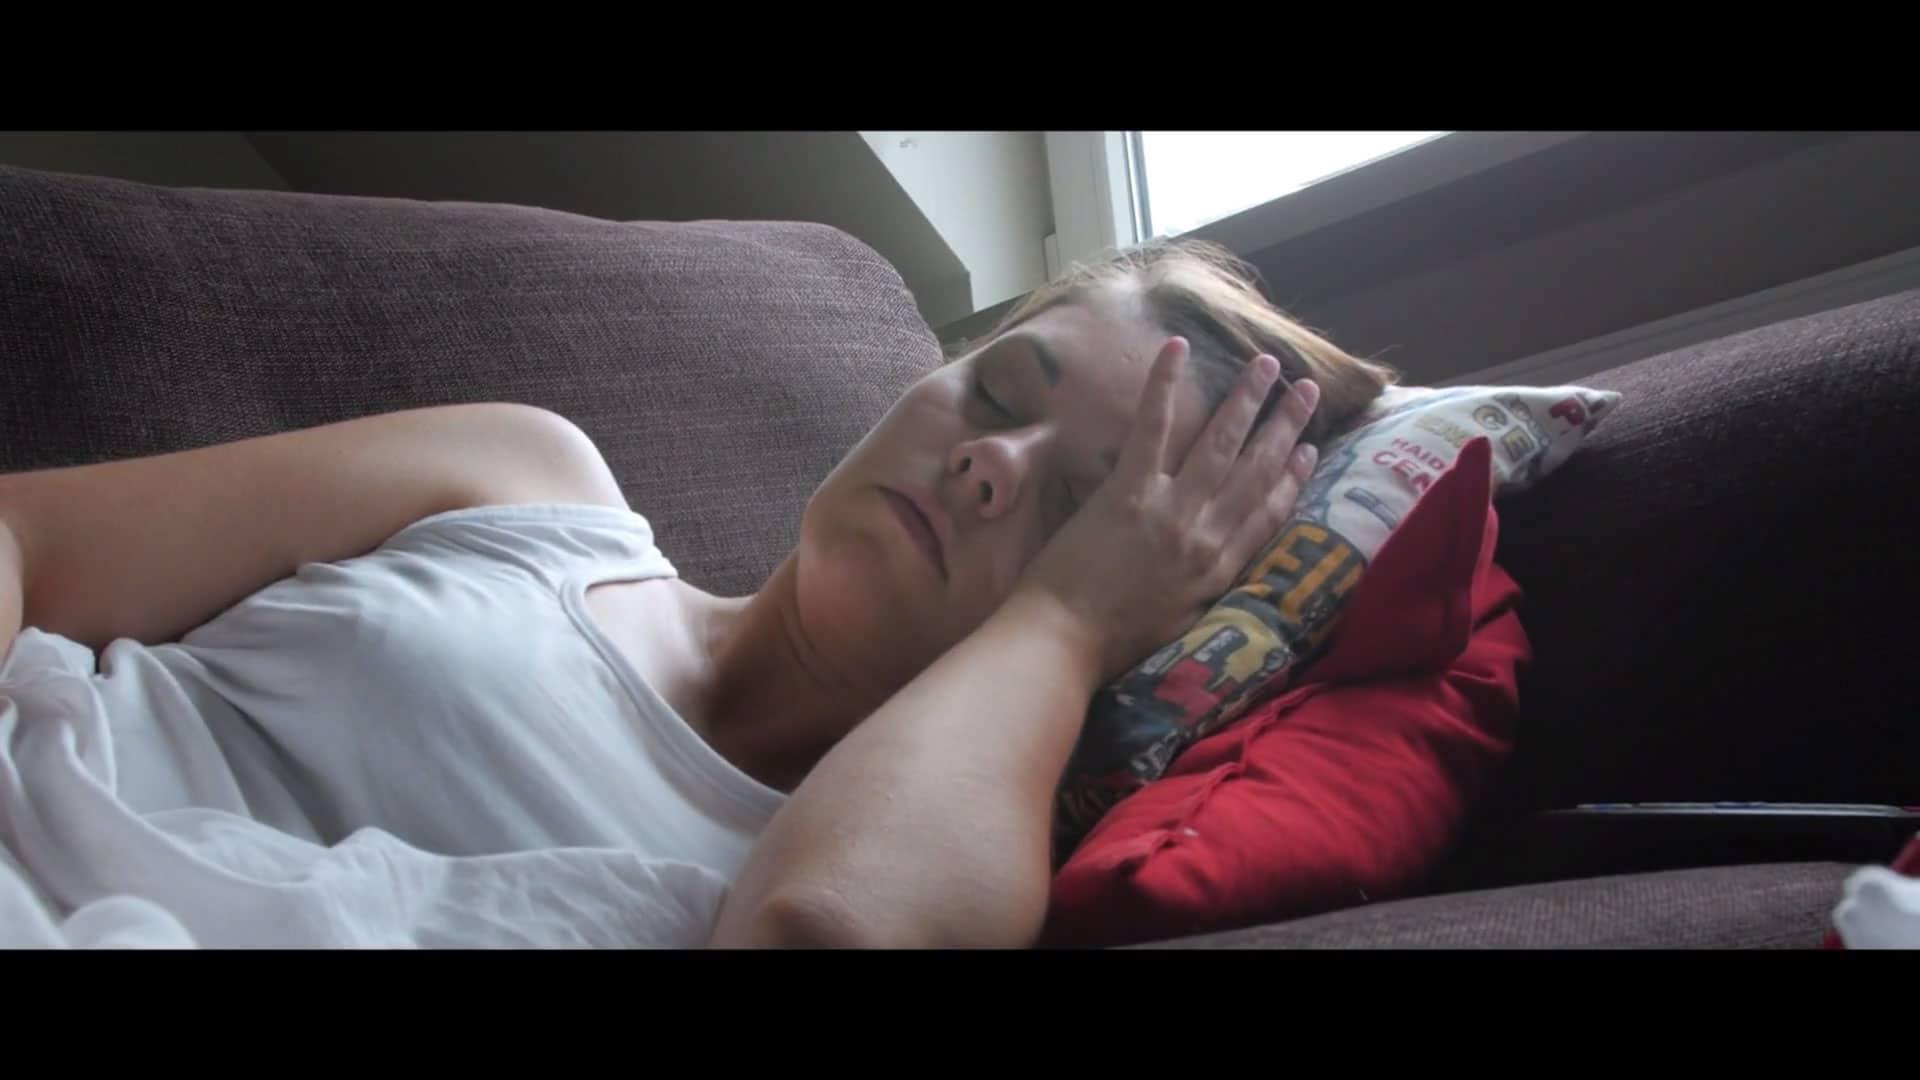 Endometriose patiënt met pijn